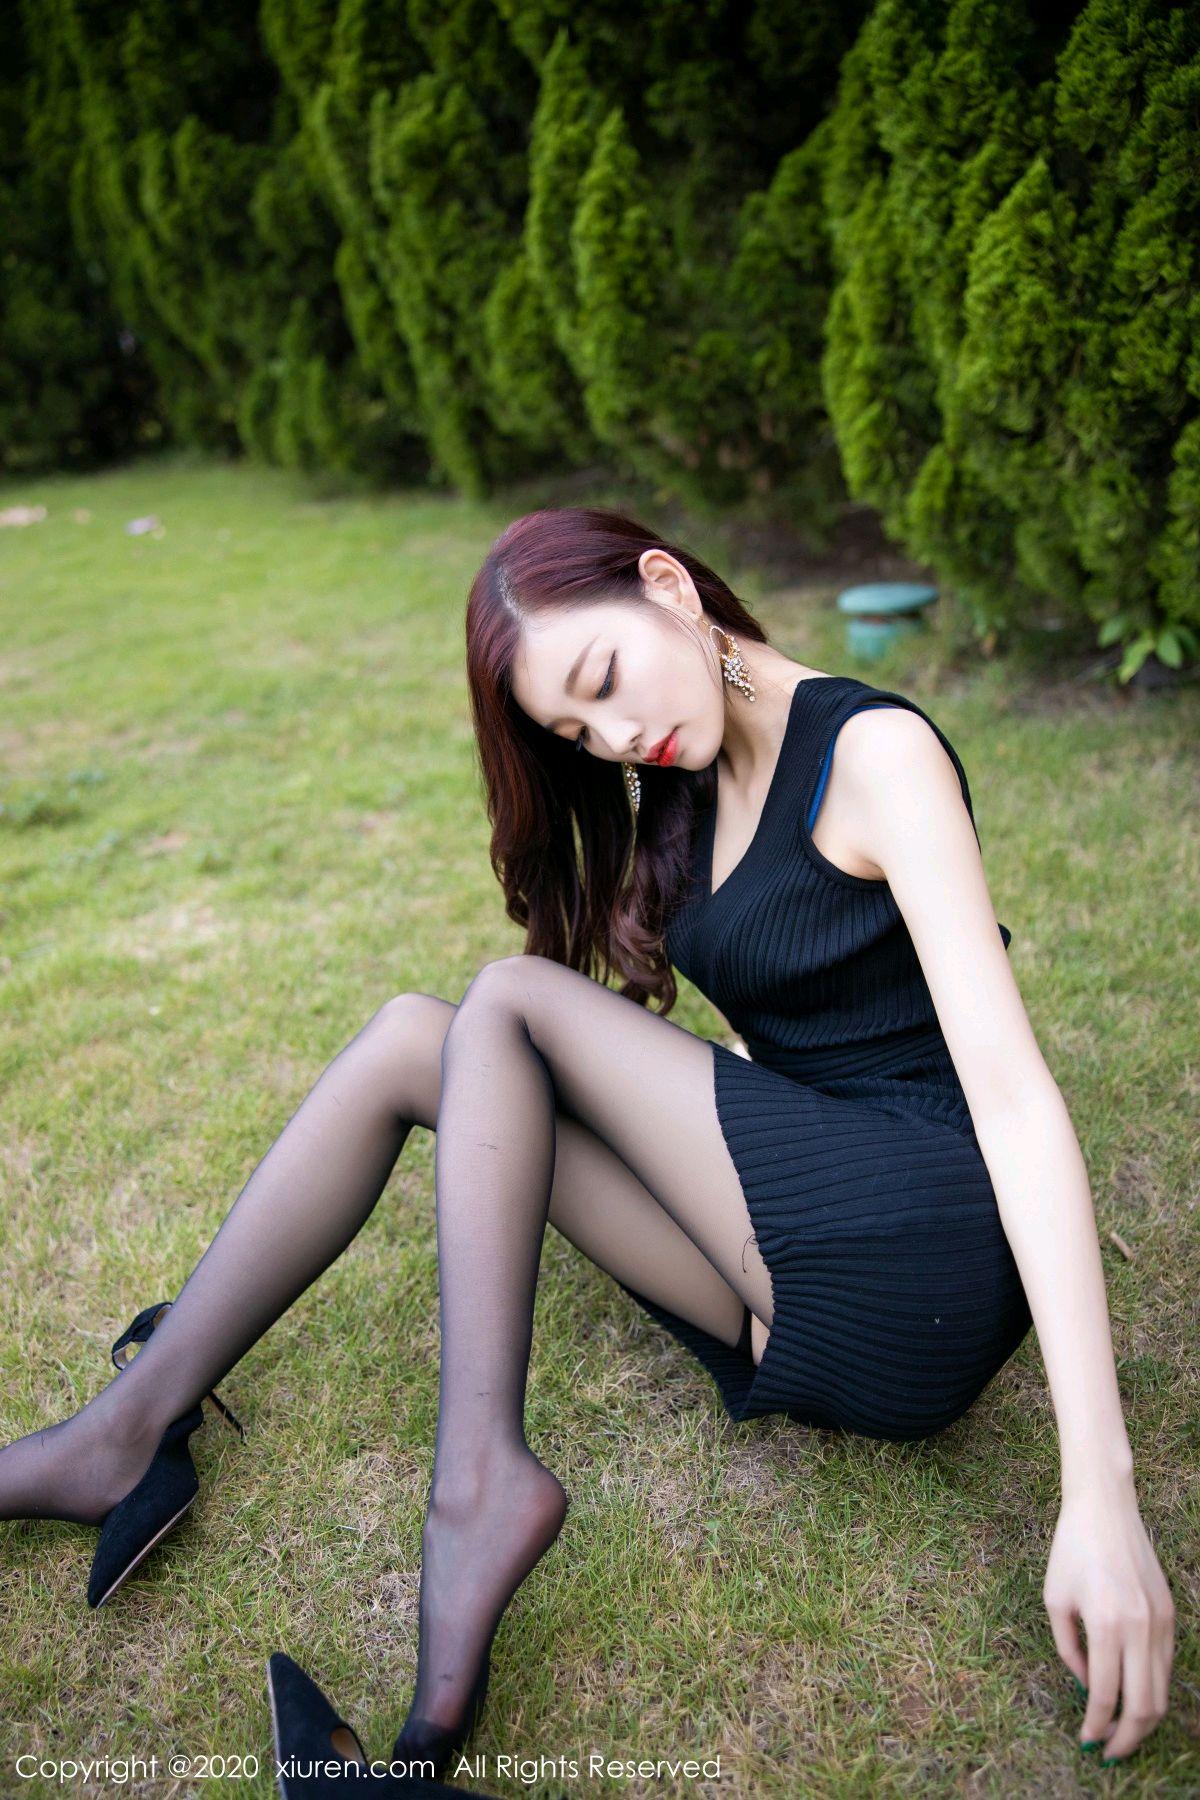 [XiuRen] Vol.2648 Yang Chen Chen 23P, Black Silk, Outdoor, Xiuren, Yang Chen Chen